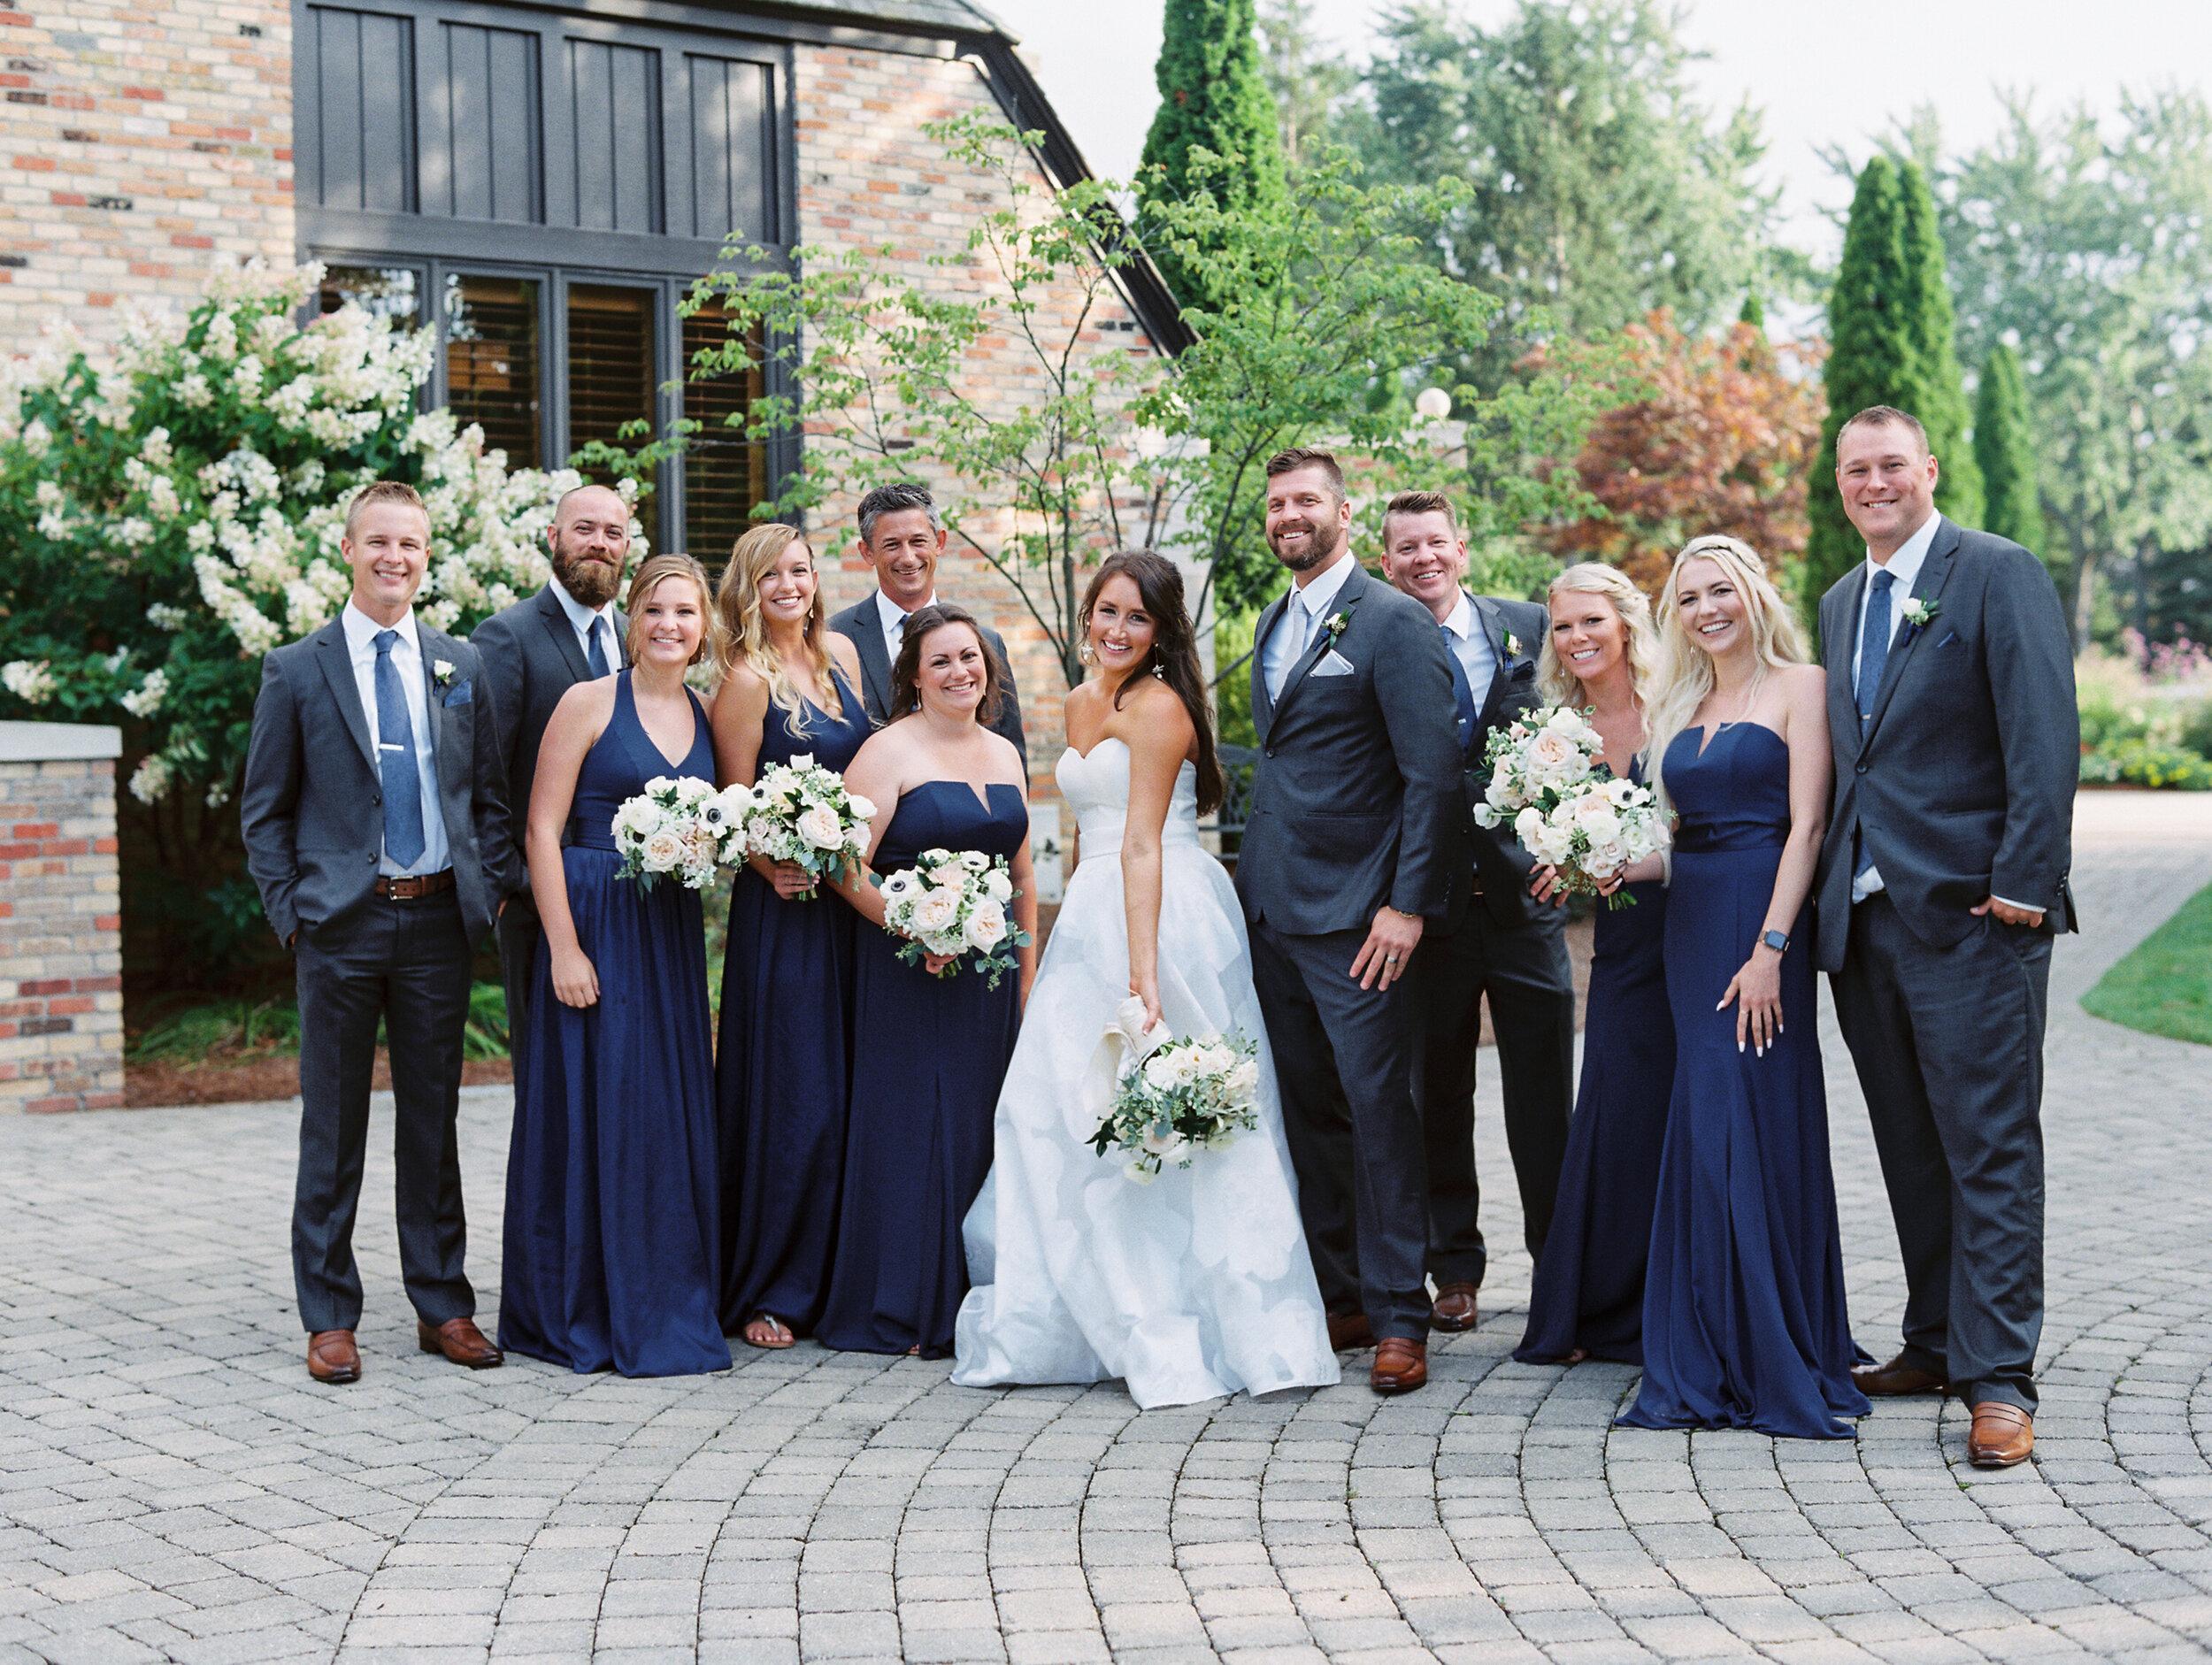 Kuiper+Wedding+Reception+Bridal+Party-114.jpg